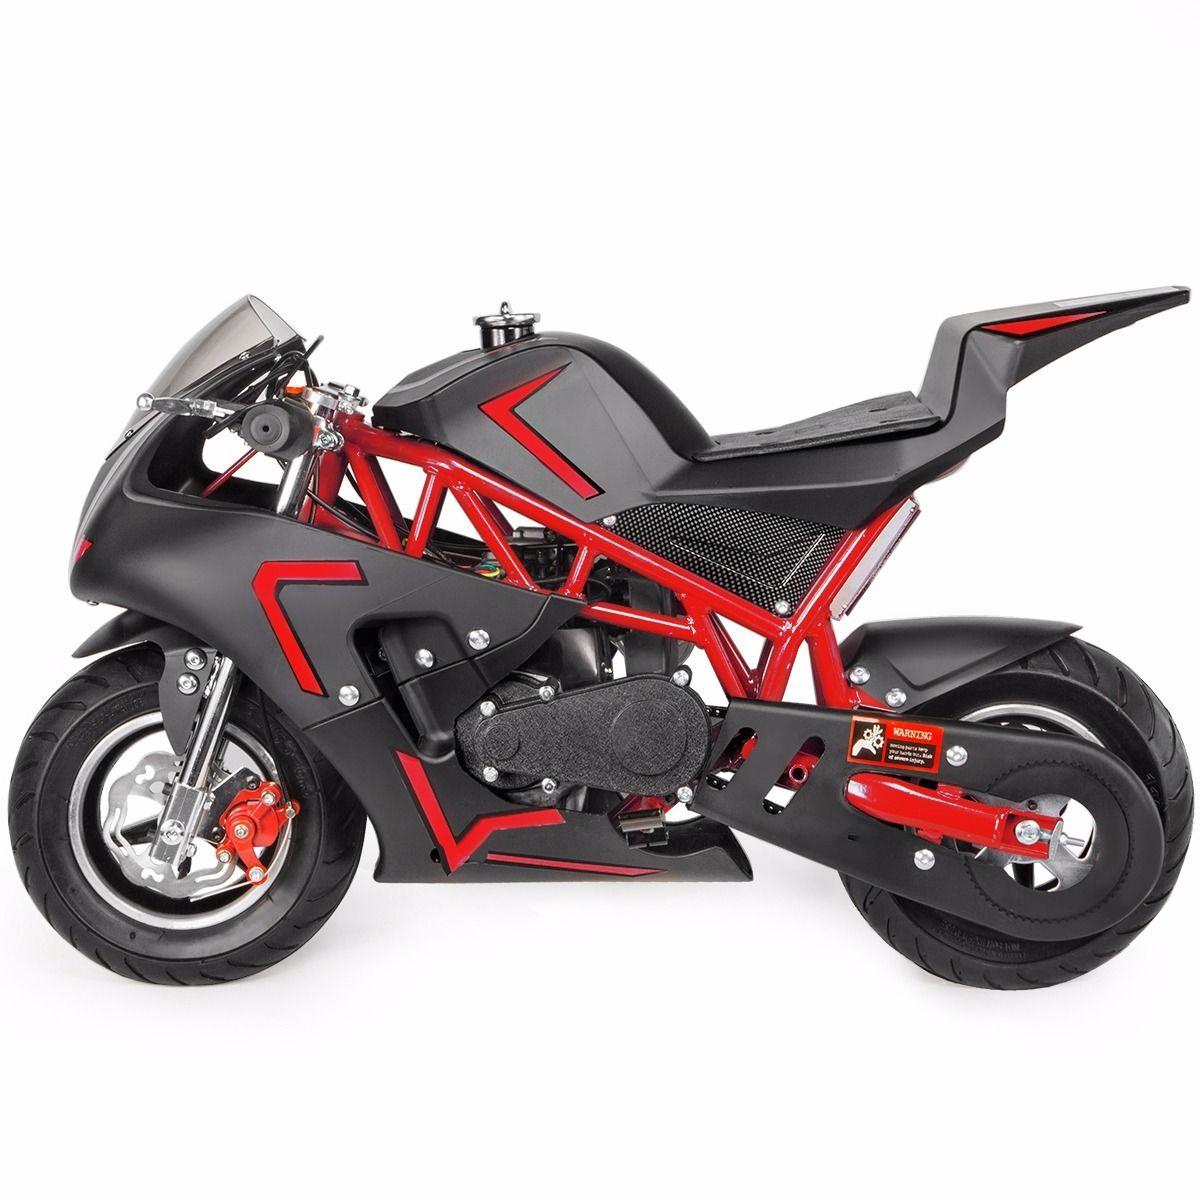 XtremepowerUS-Gas-Pocket-Bike-Motor-Bike-Scooter-40cc-Epa-Engine-Motorcycle thumbnail 27